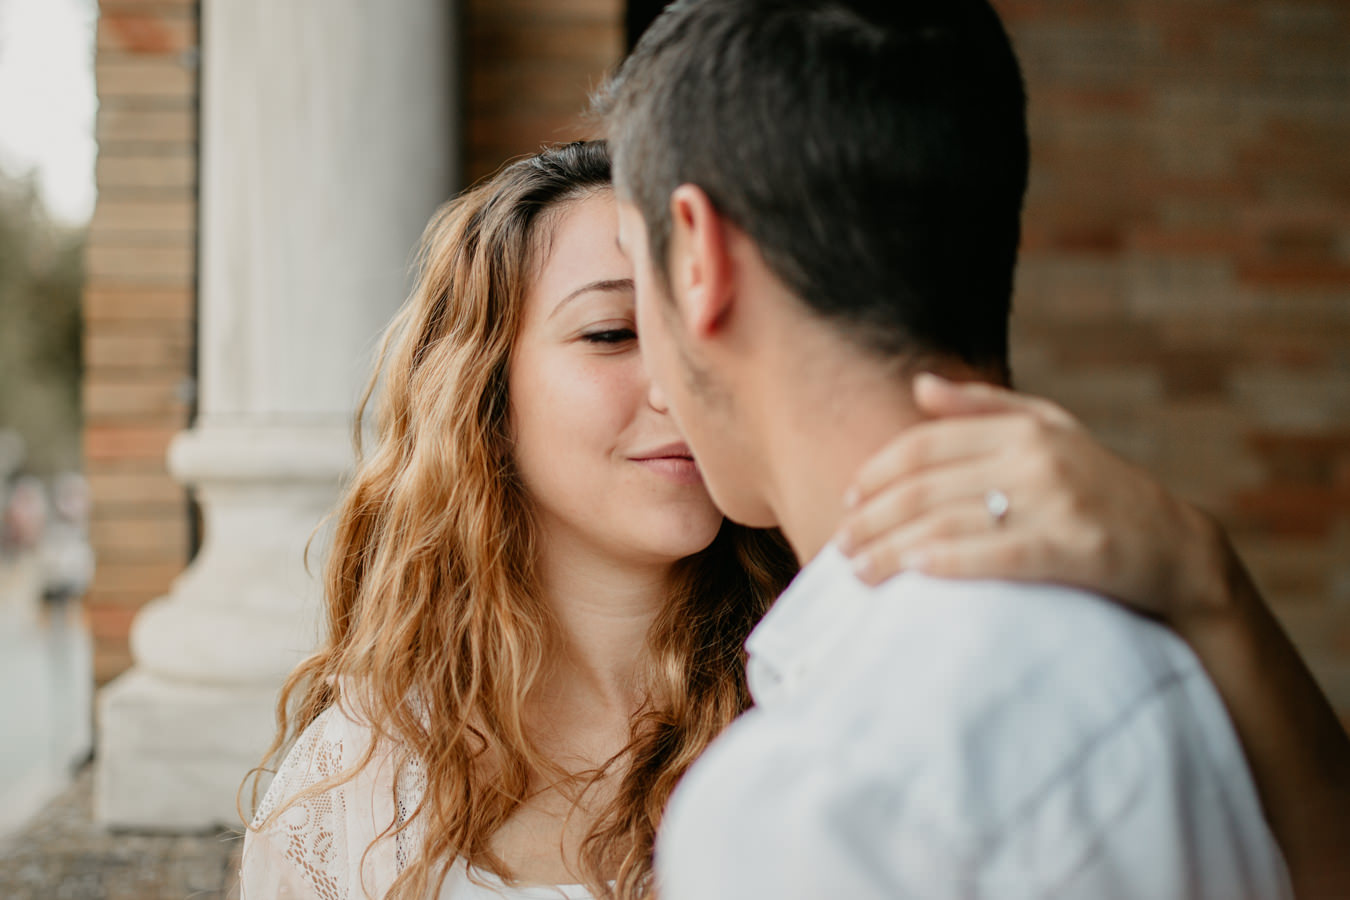 romantica pedida de mano en plaza de espana